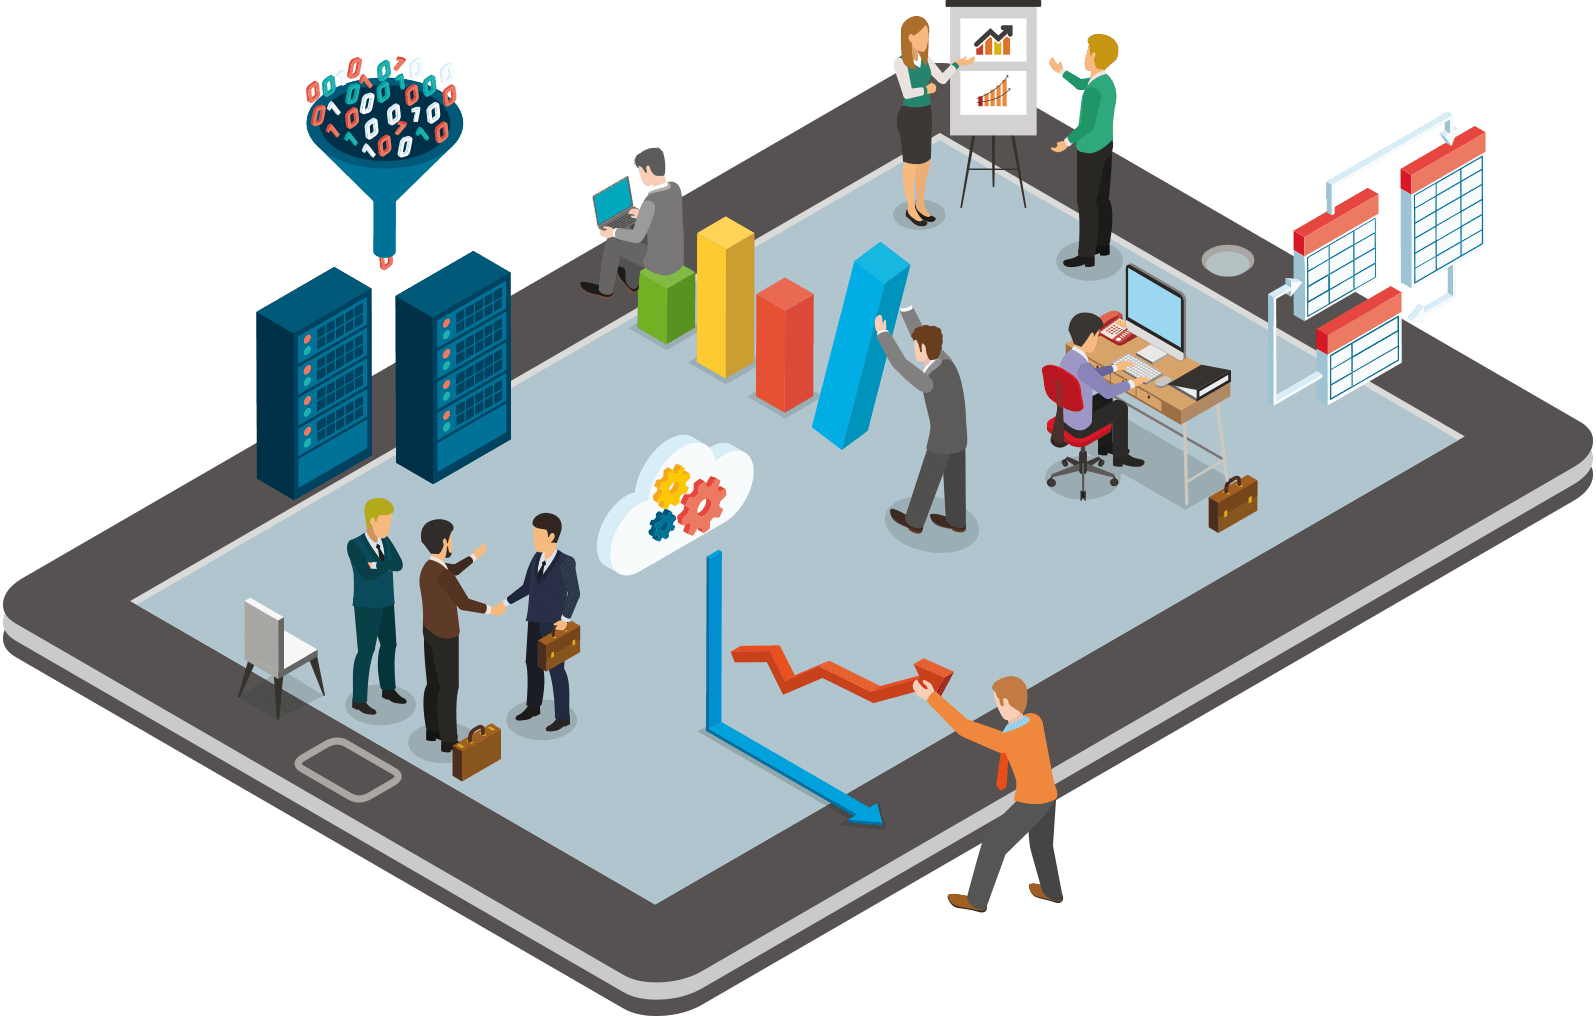 Grafik Business Partner 4.0